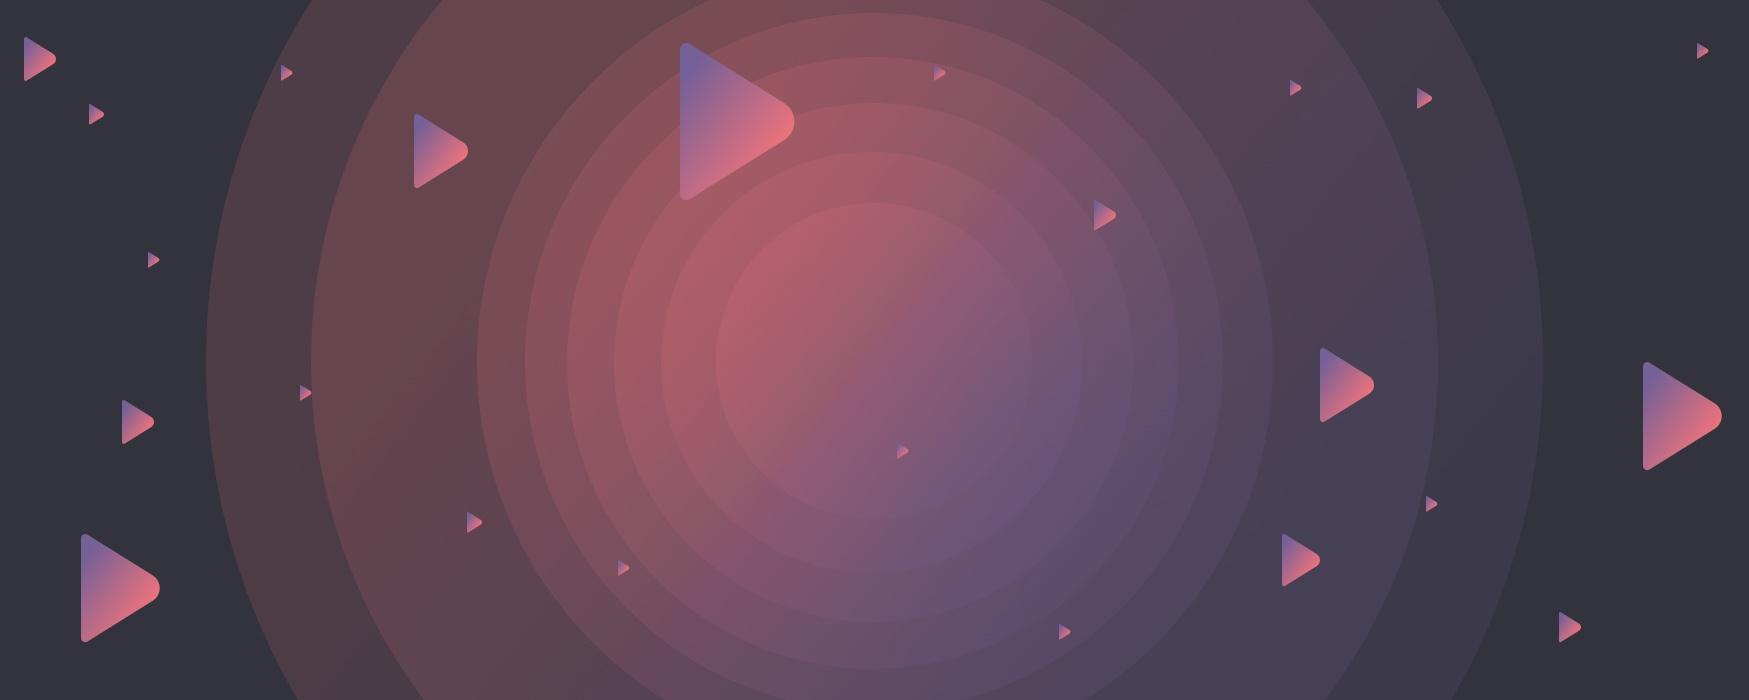 unleash-the-power-of-video-webinar-lp.jpg